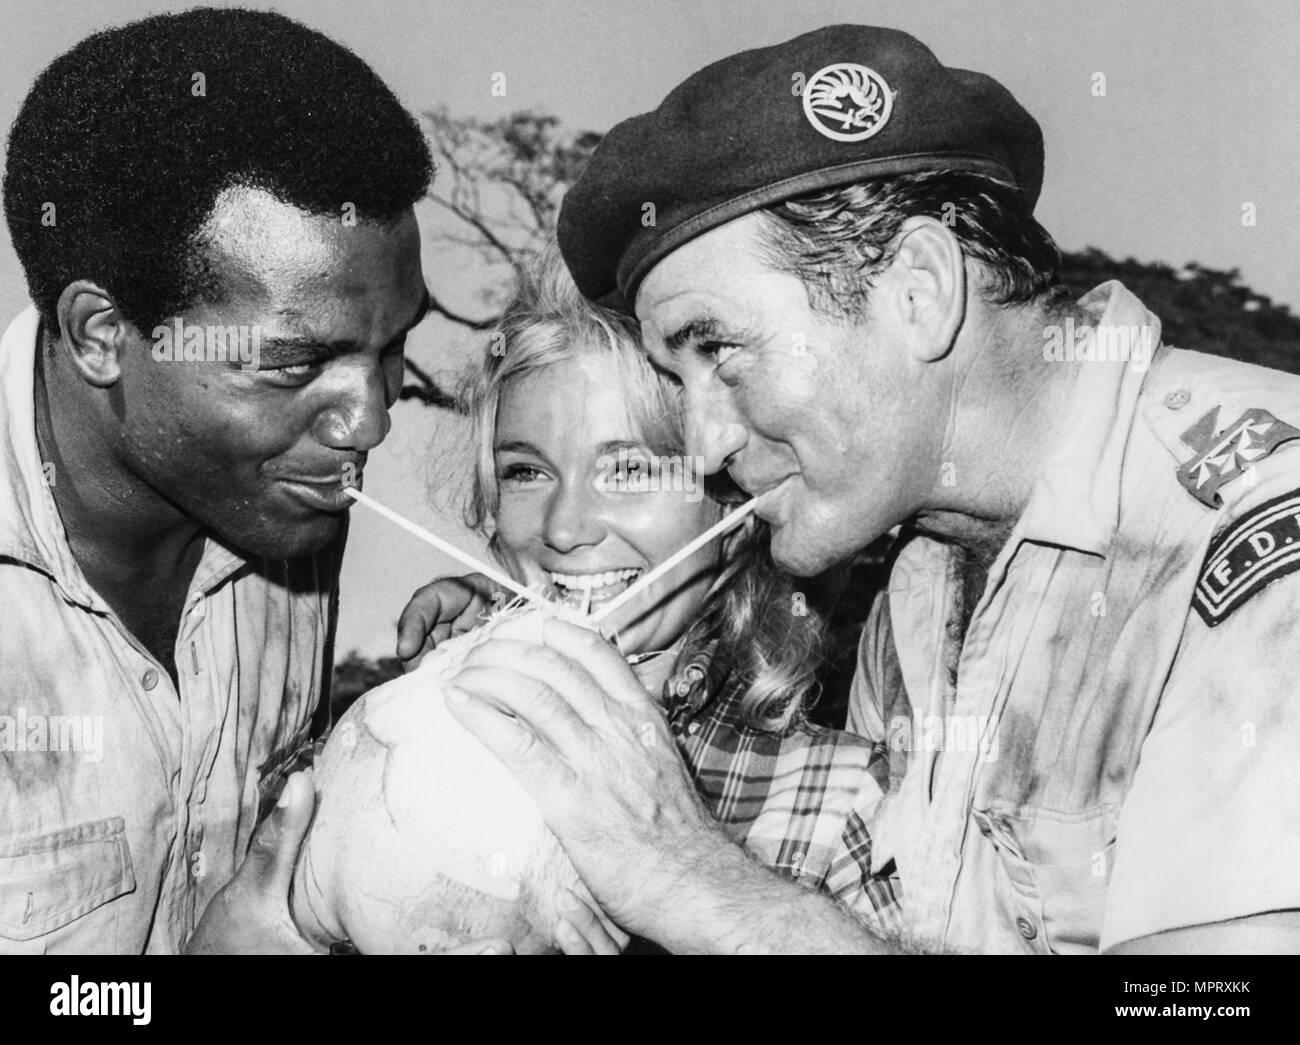 jim brown, yvette mimieux, rod taylor, 1967 - Stock Image